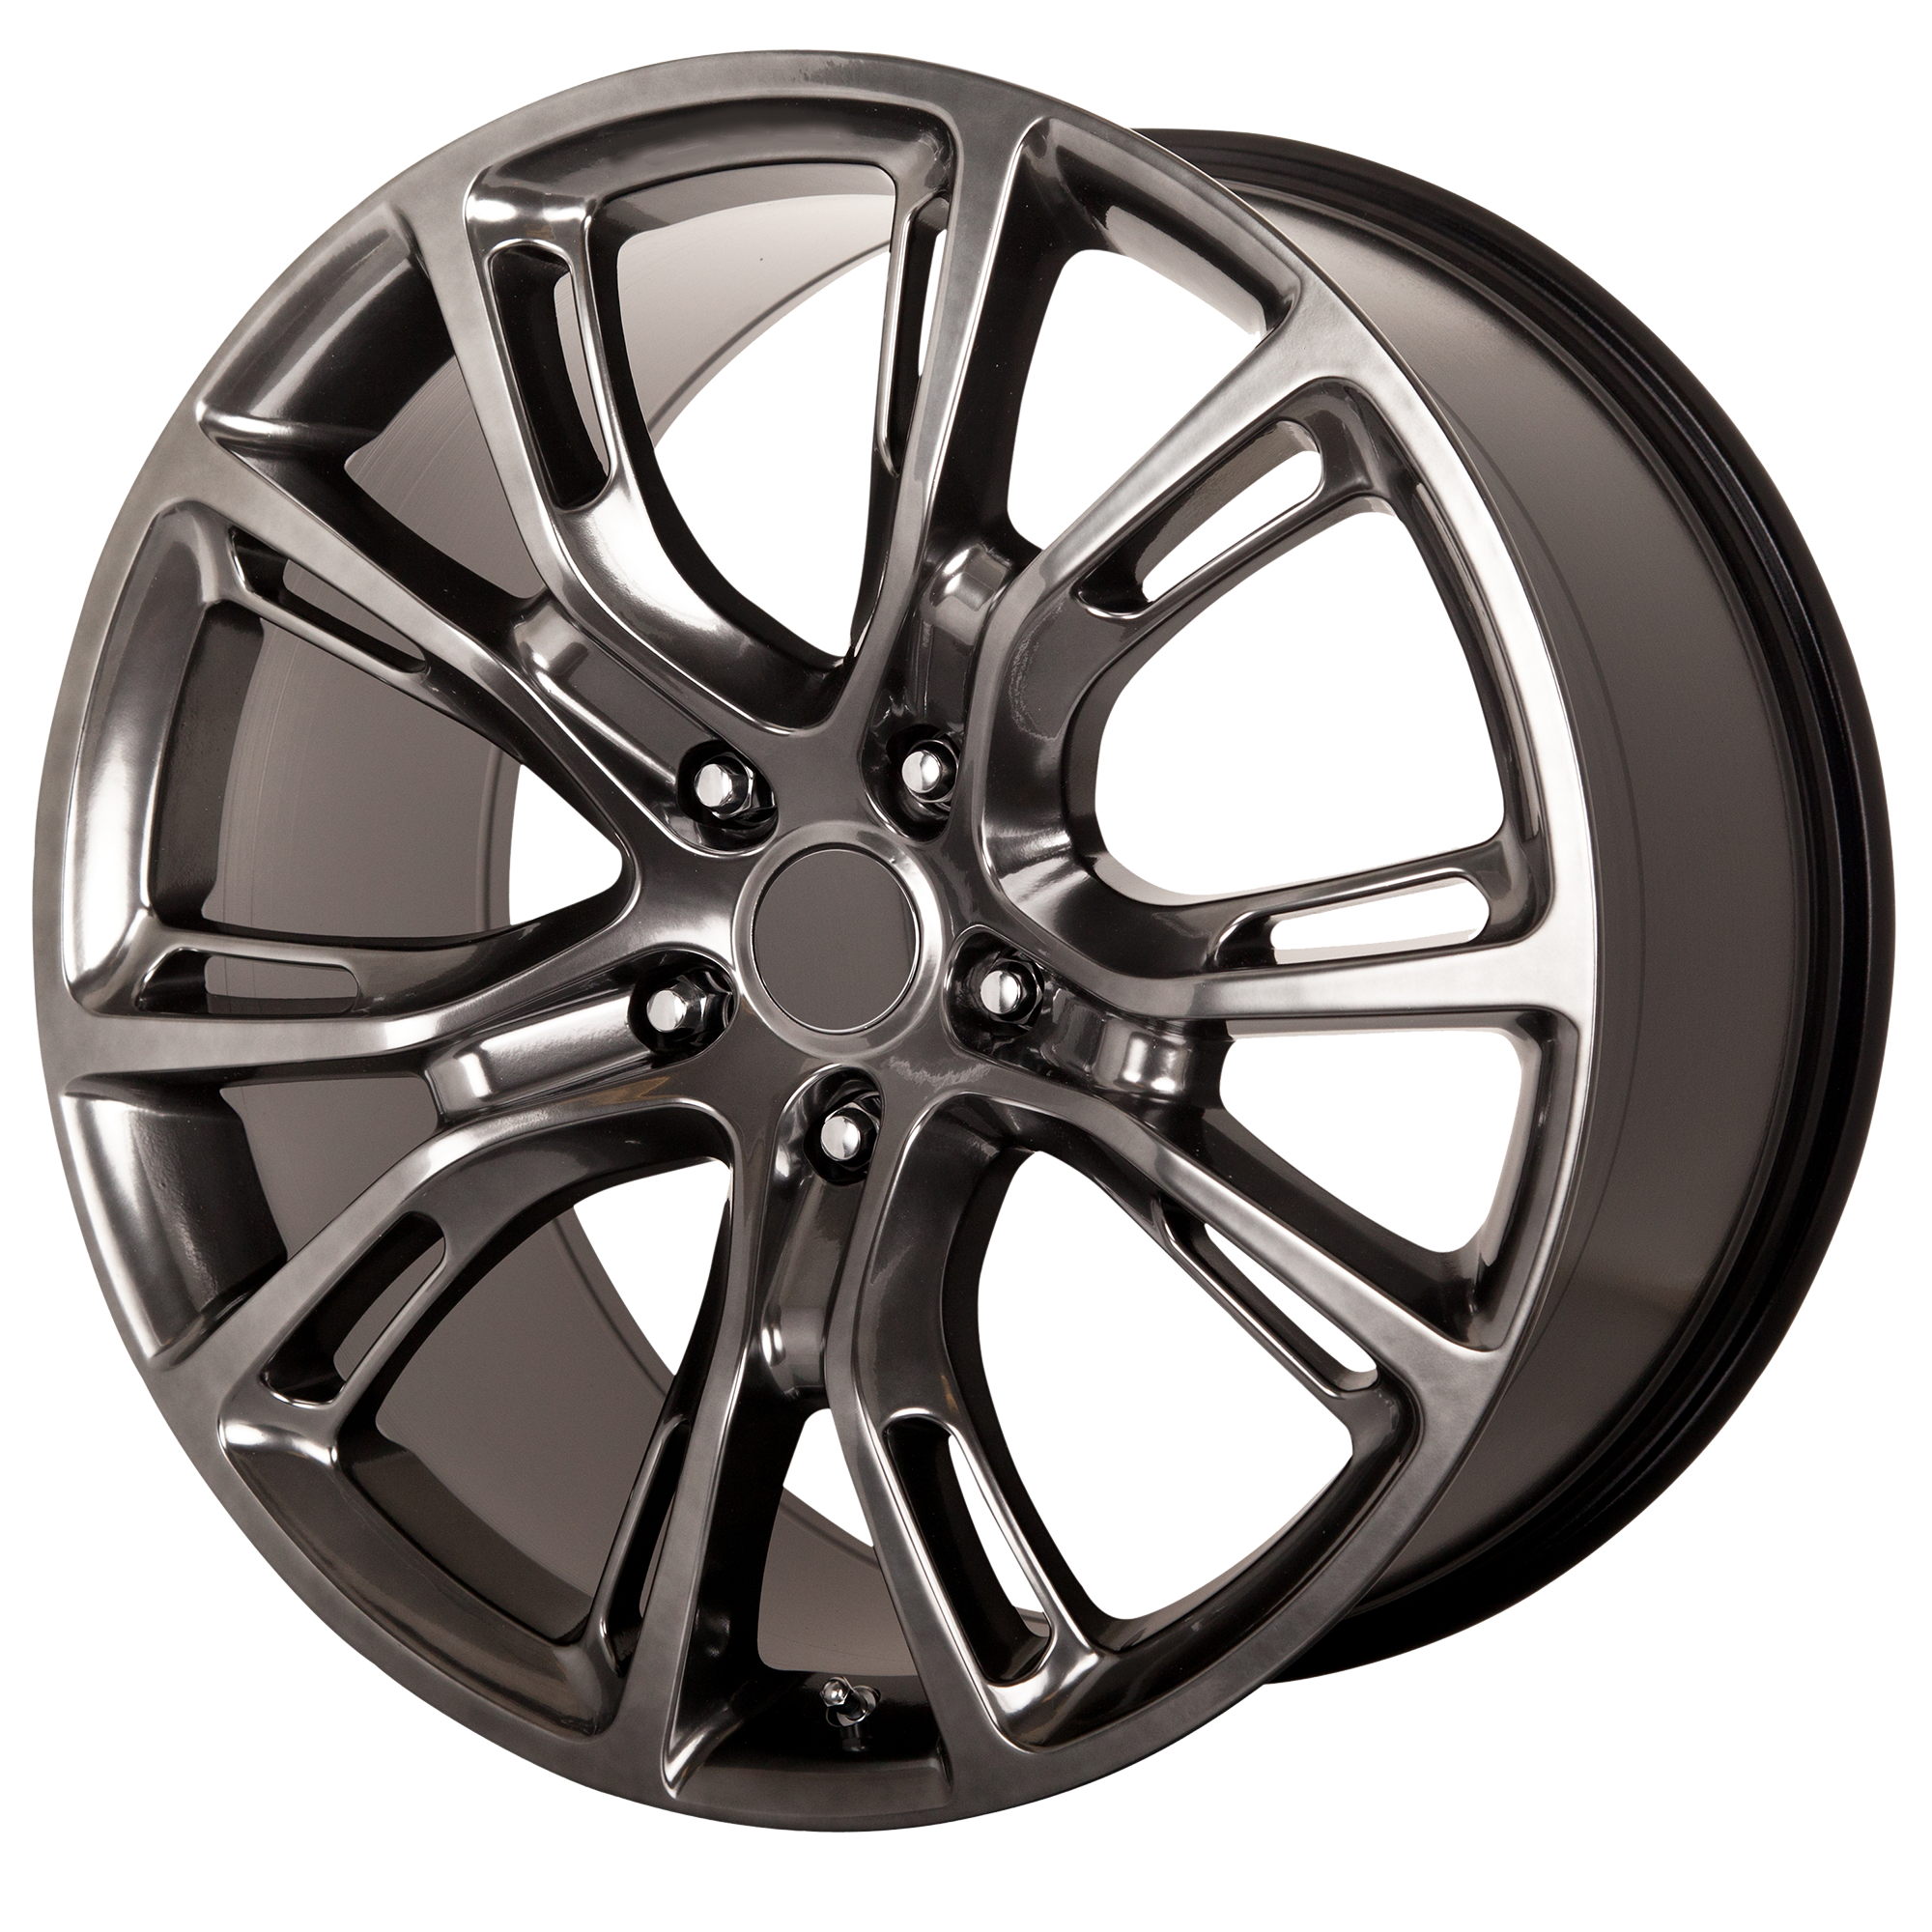 OE Creations Replica Wheels OE Creations PR137 Hyper Black